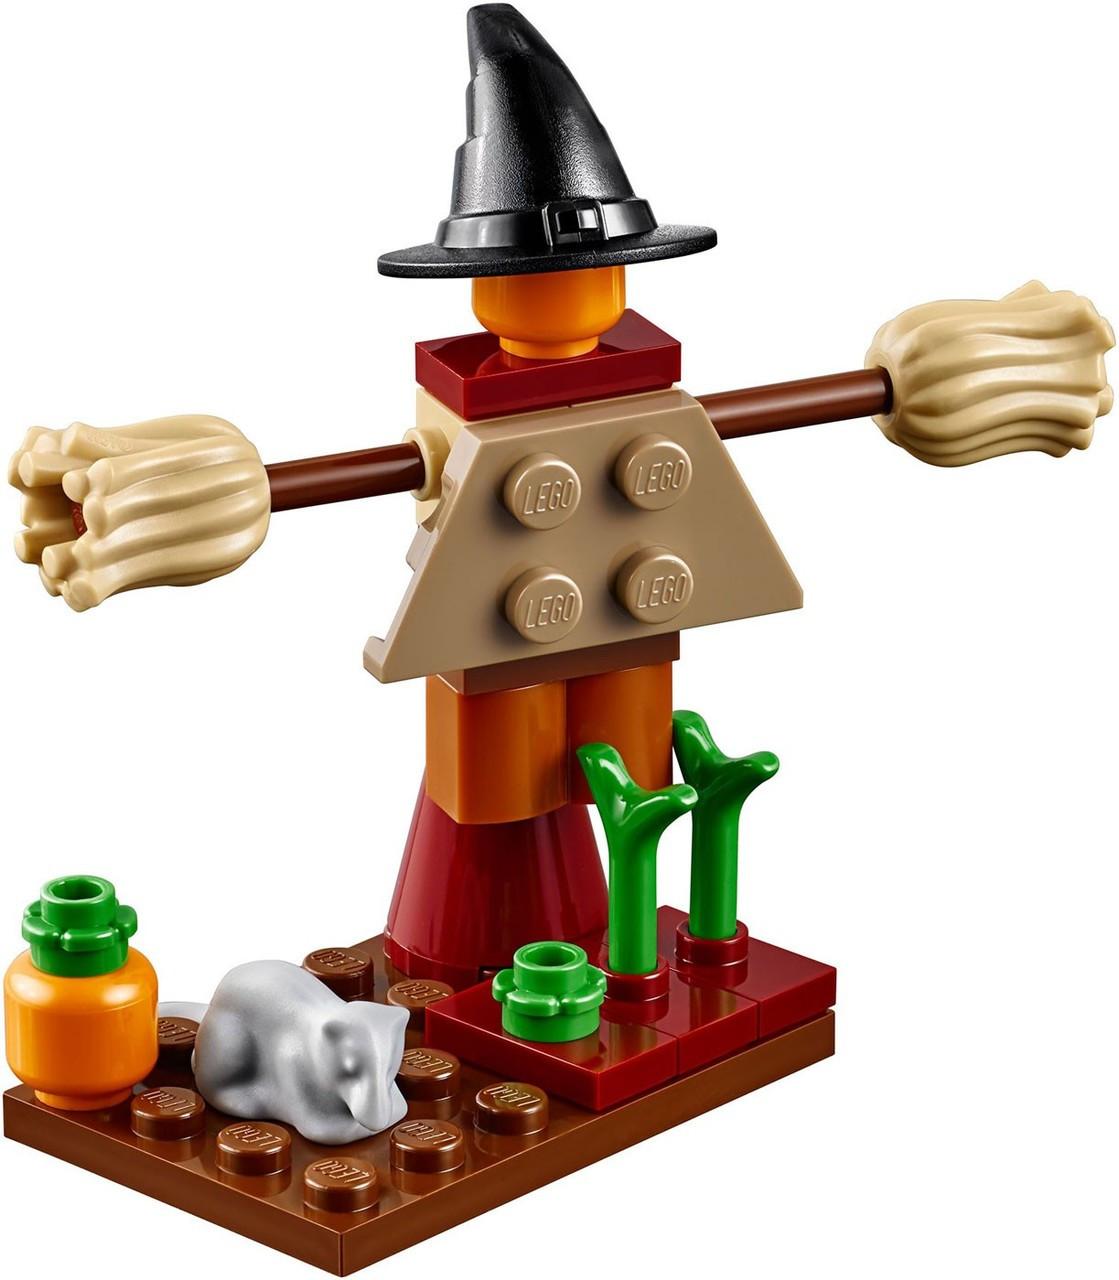 LEGO Monthly Mini Builds Scarecrow Set 40285 - ToyWiz